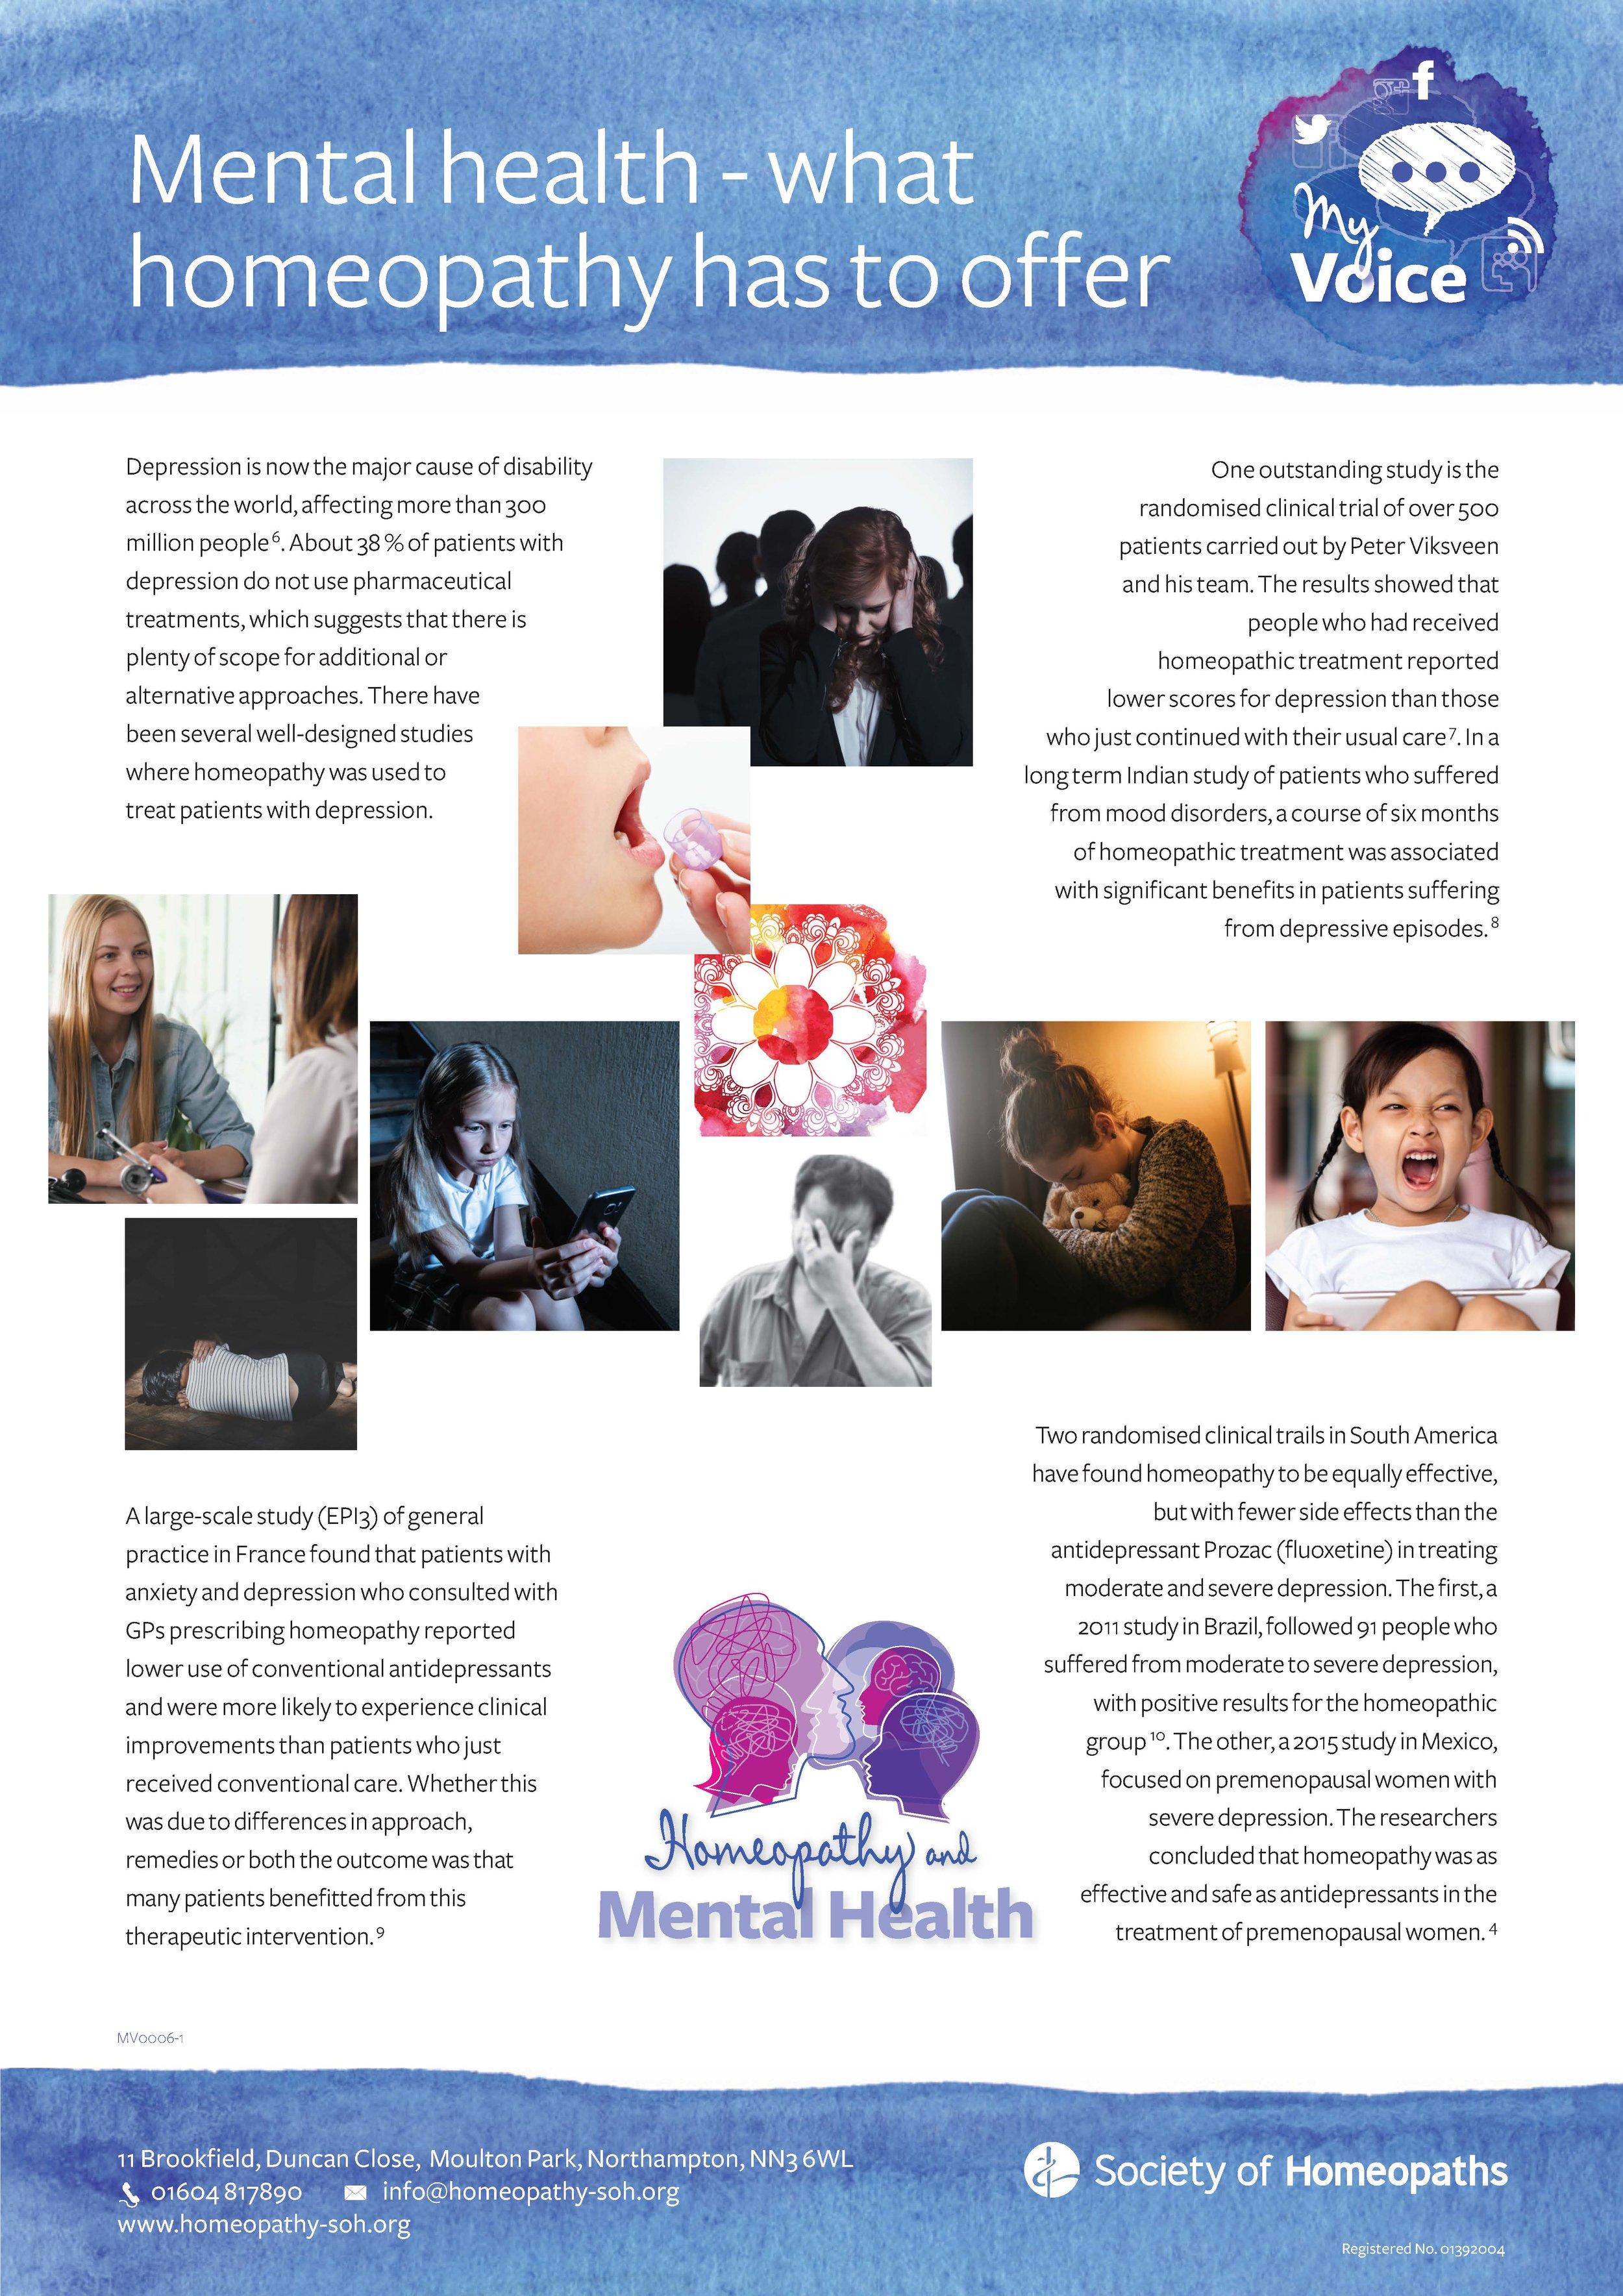 soh_mentalHealth_homeopathy_Page_2.jpg